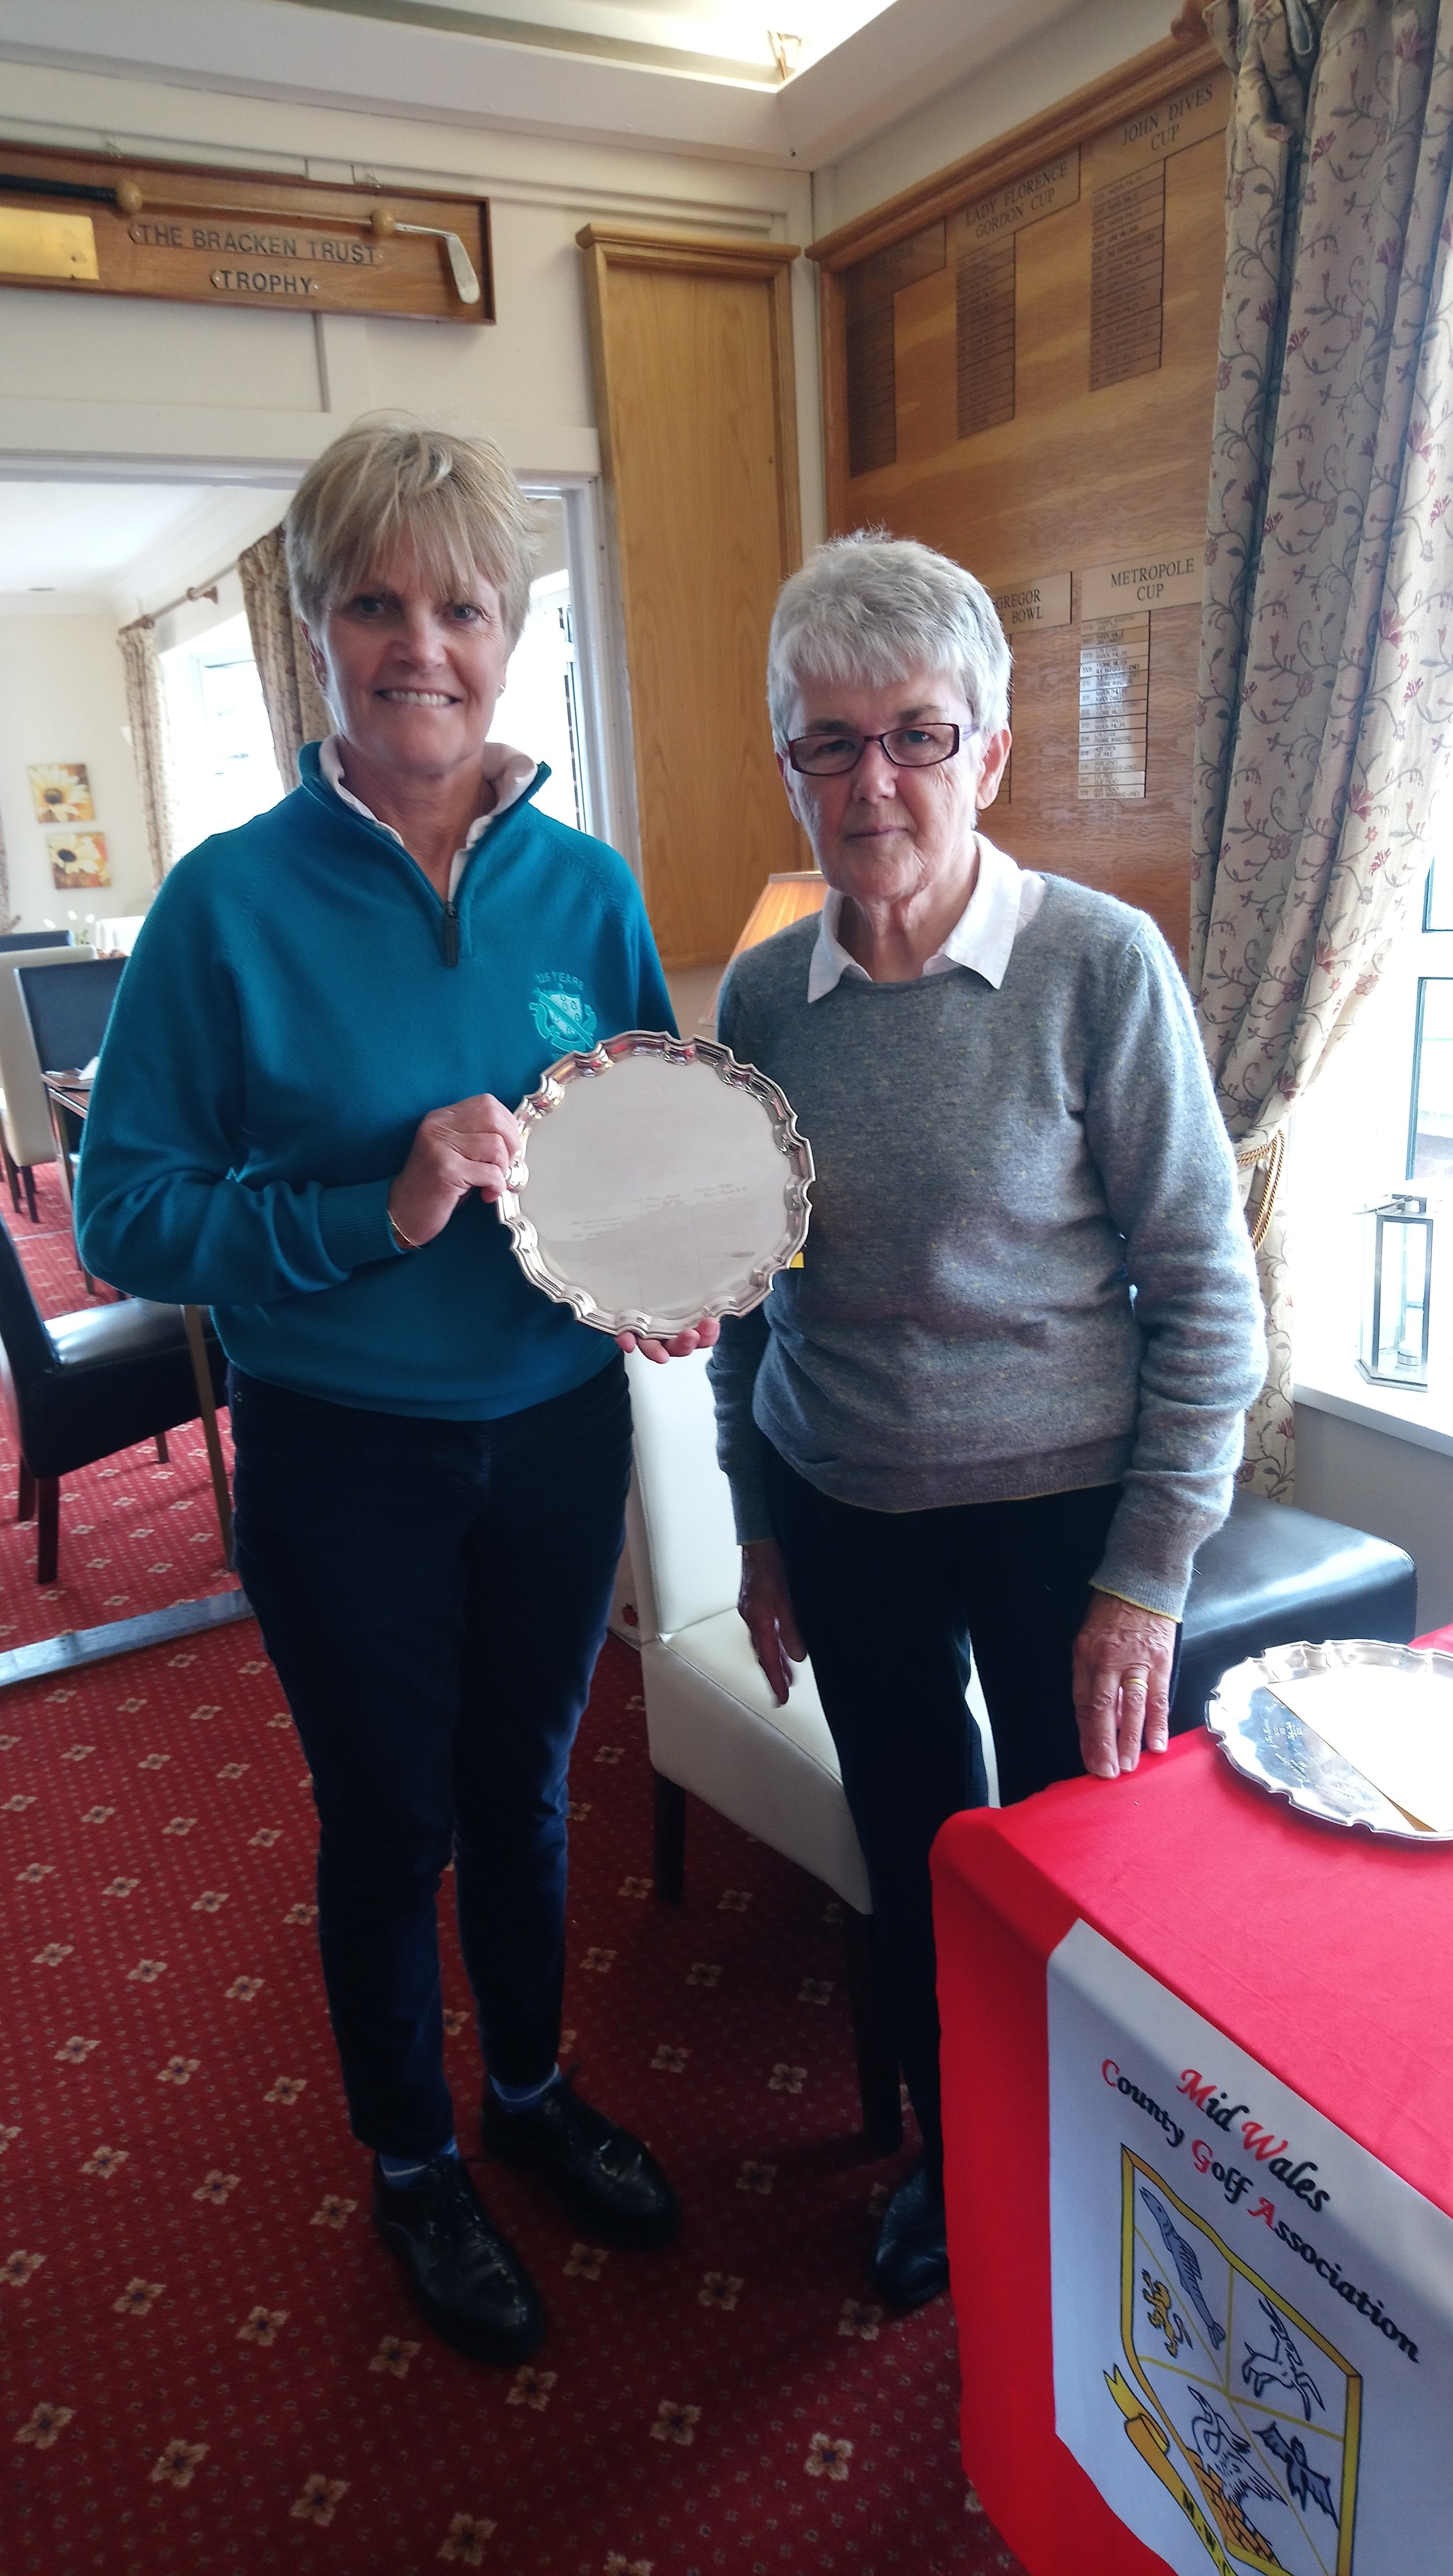 Plate winner, Mary Upson